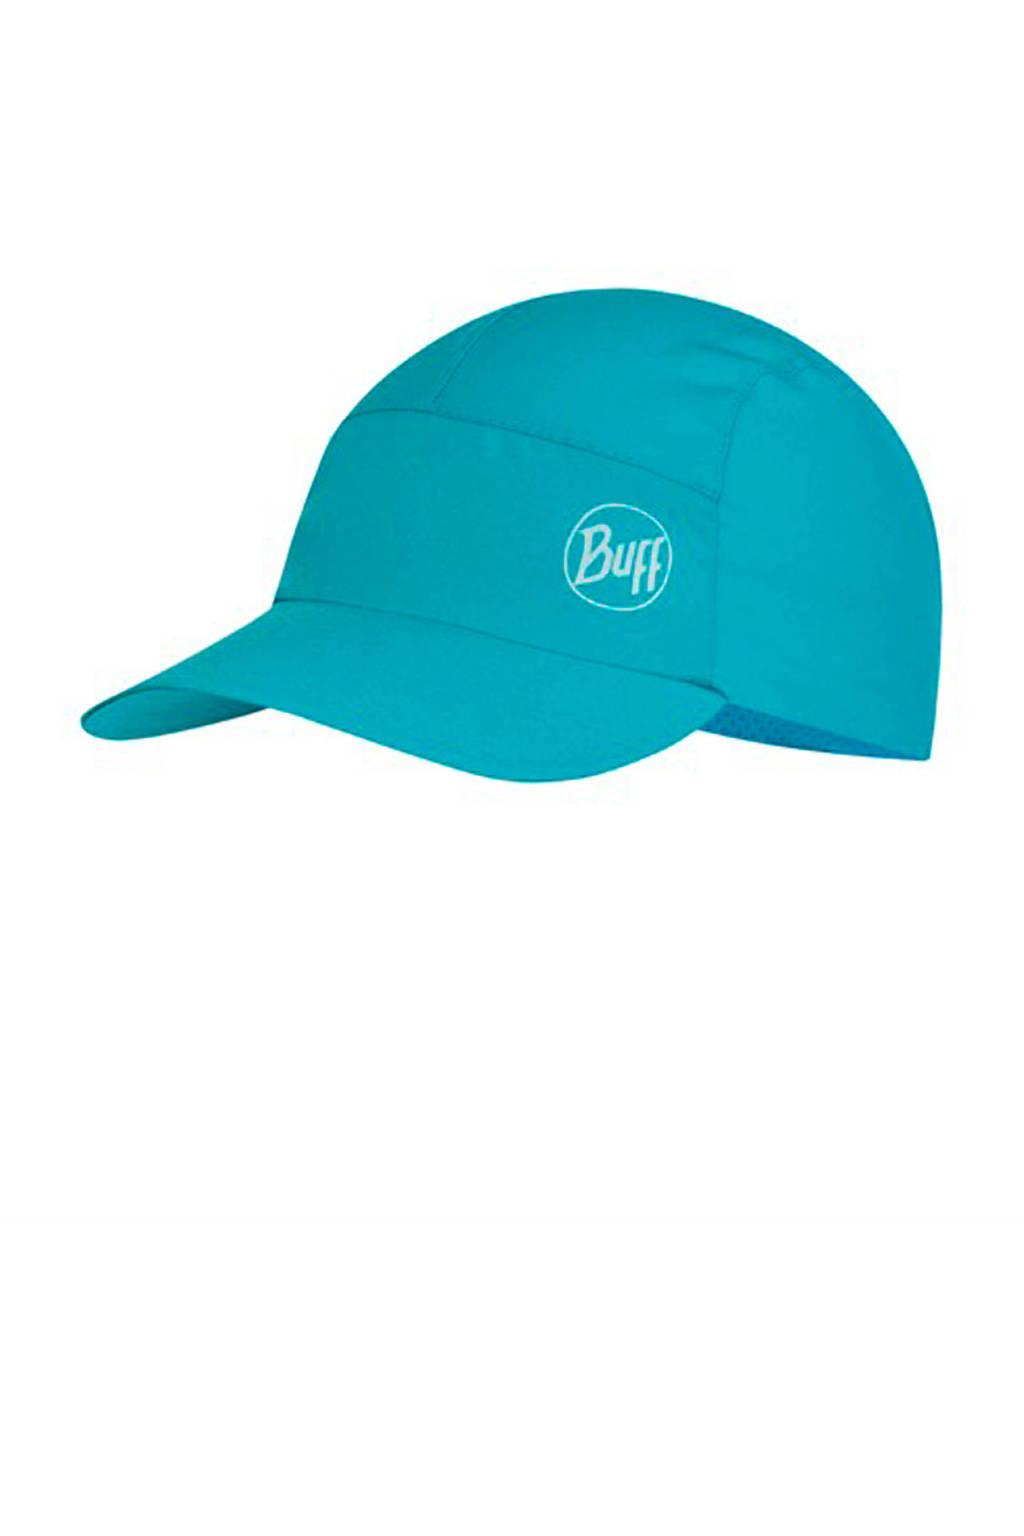 Buff cap Back Pack turquoise, Deep Sea Green